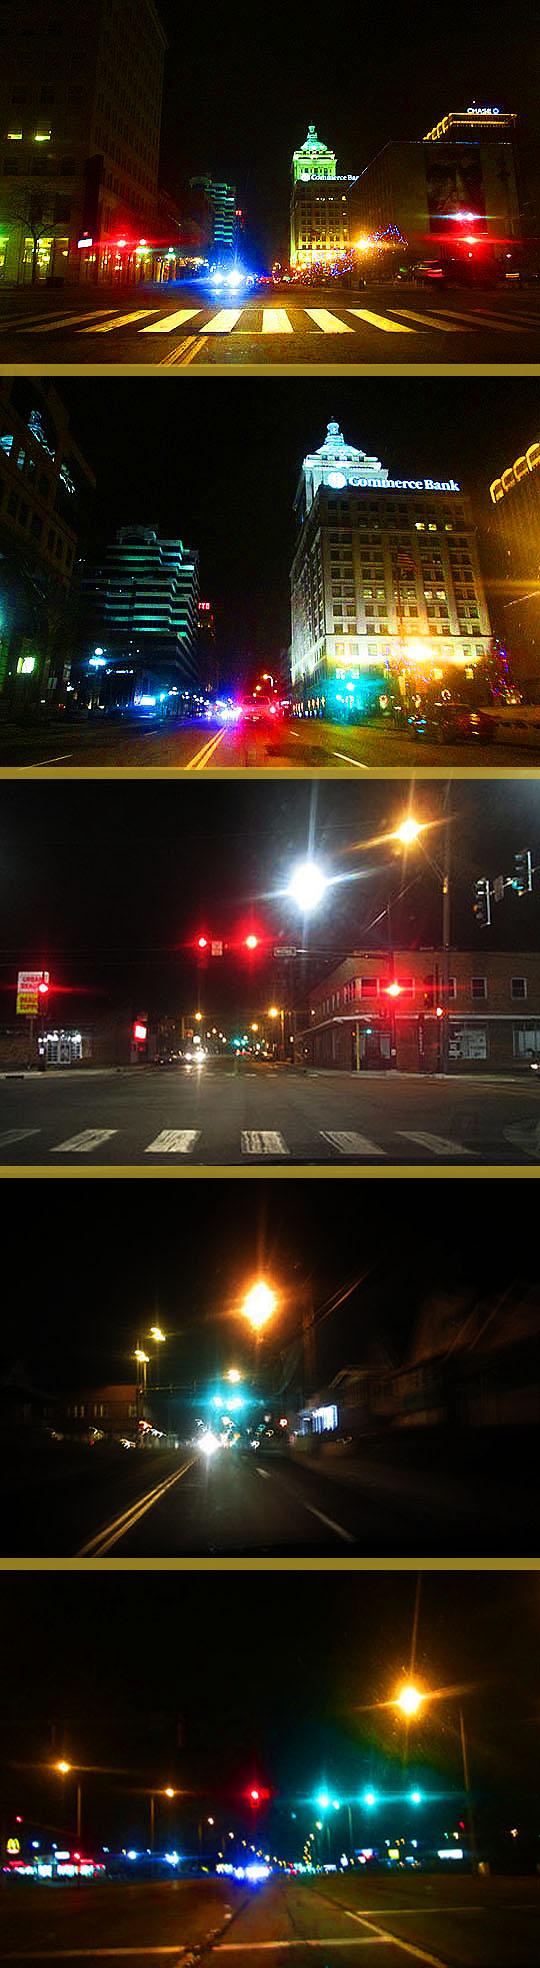 2. thedrive_jan3-19.jpg